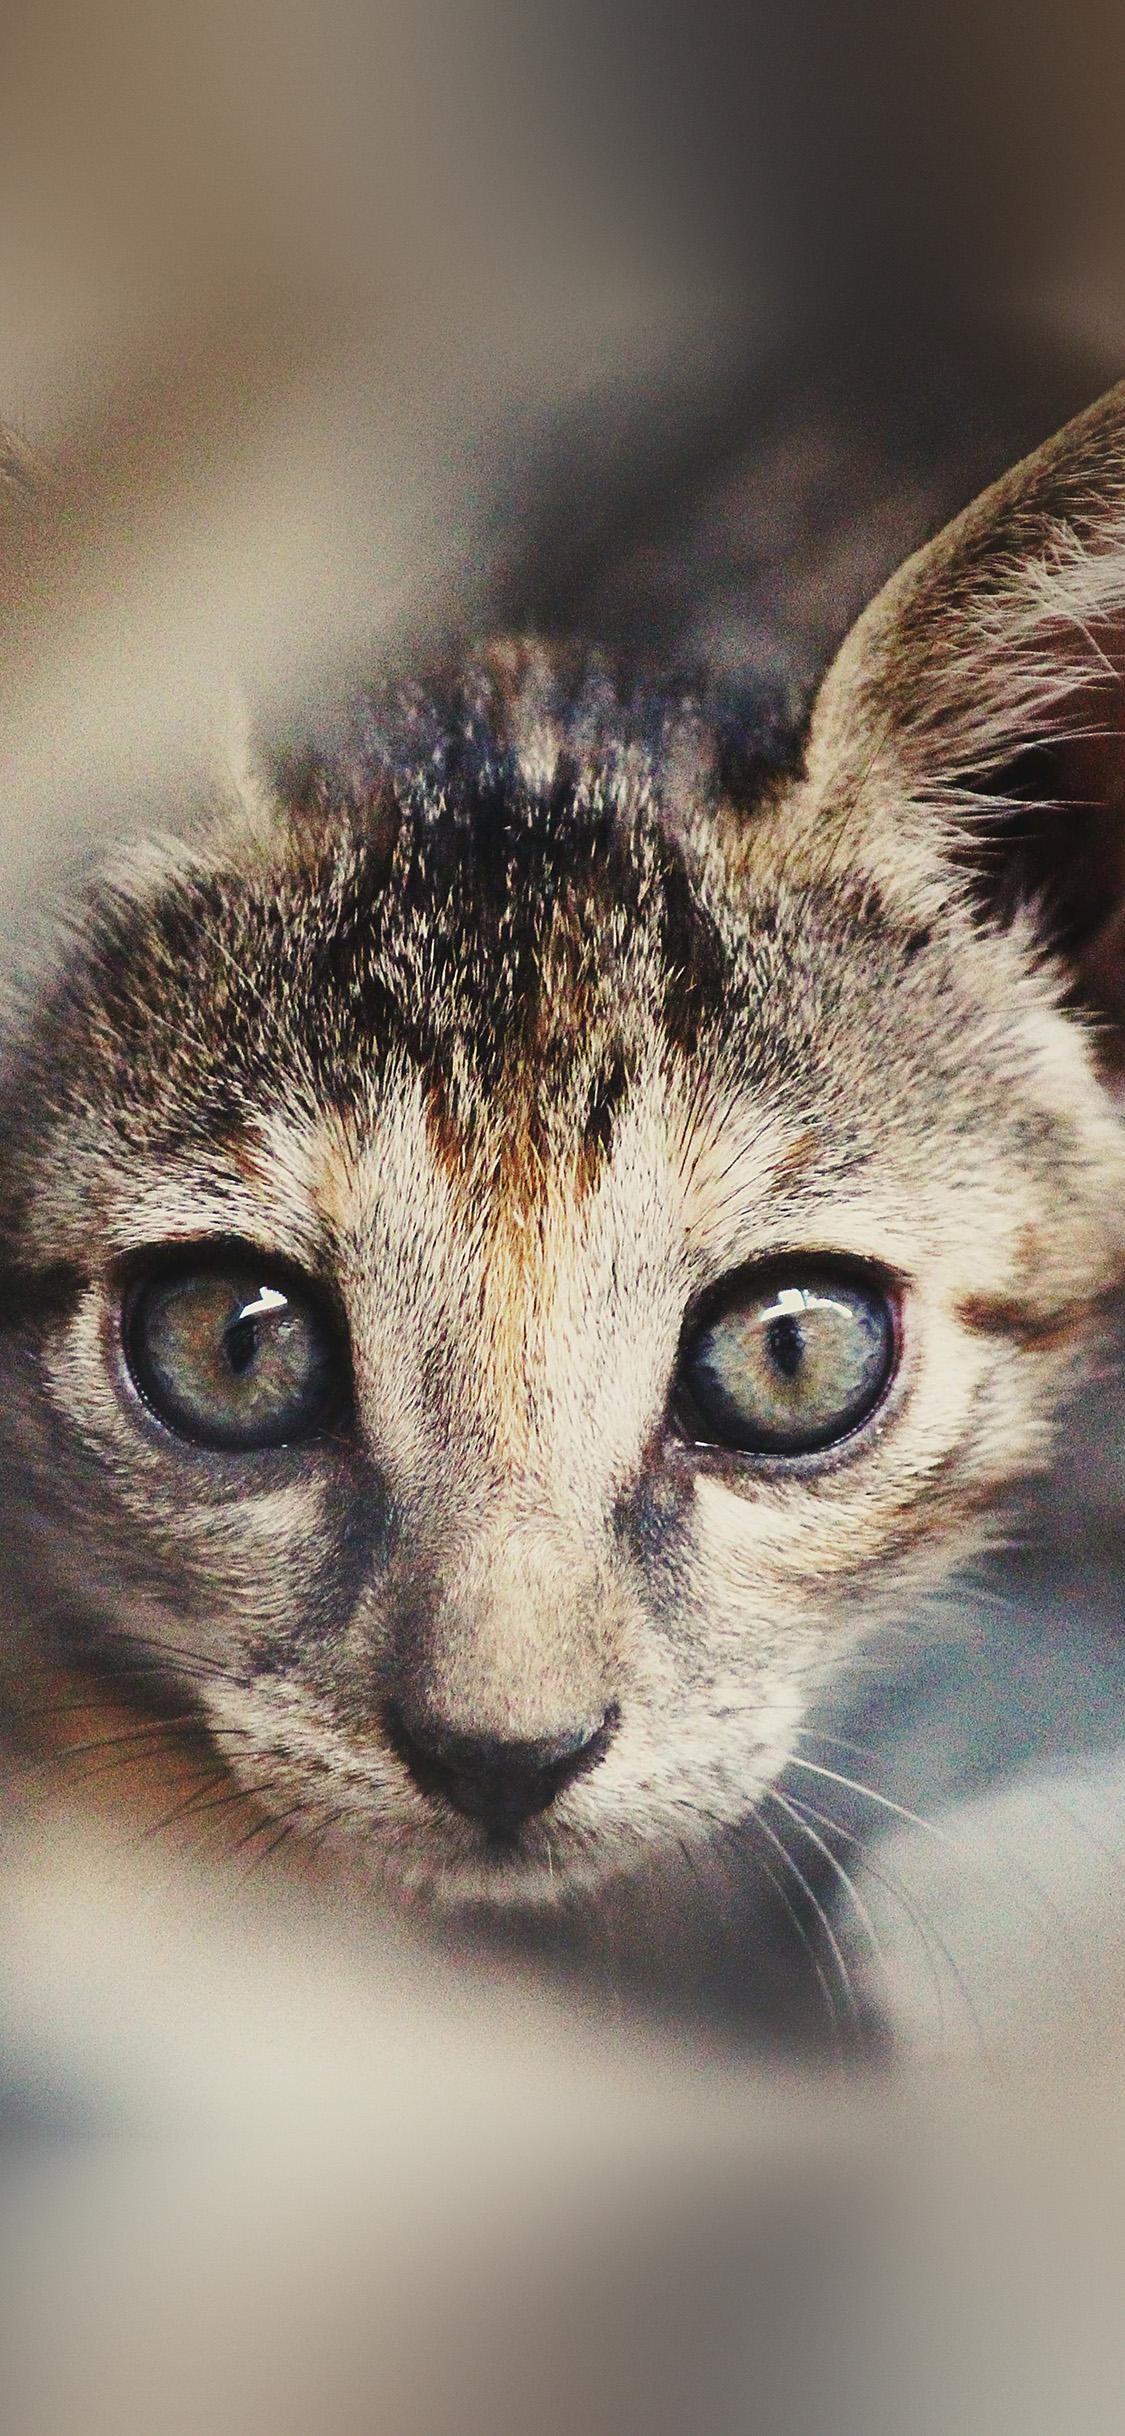 iPhonexpapers.com-Apple-iPhone-wallpaper-ny37-cat-face-cute-animal-nature